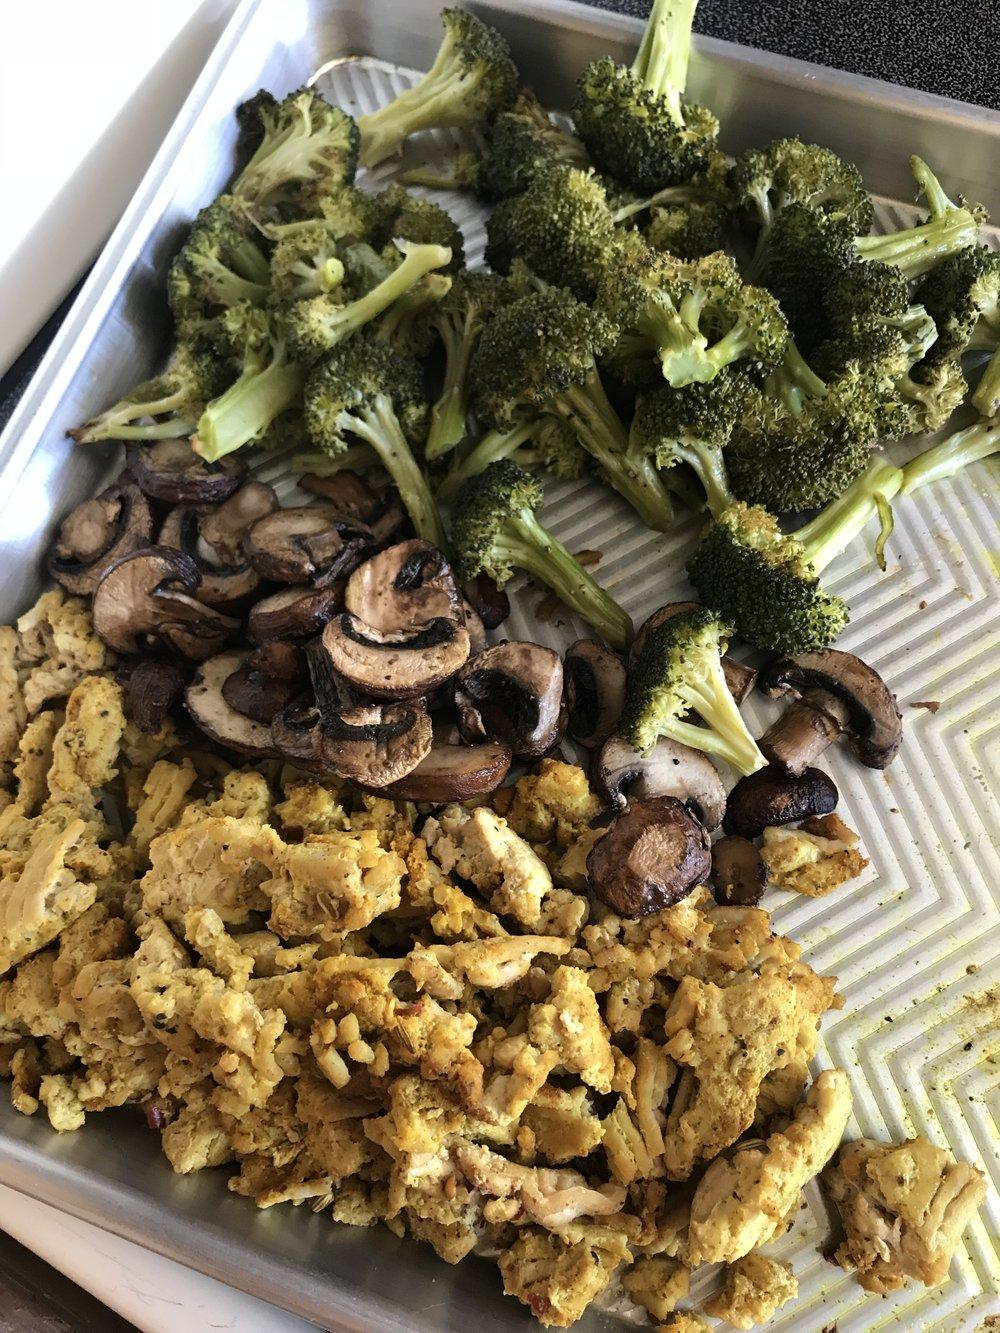 Broccoli Squash Casserole Ingredints 1.jpg